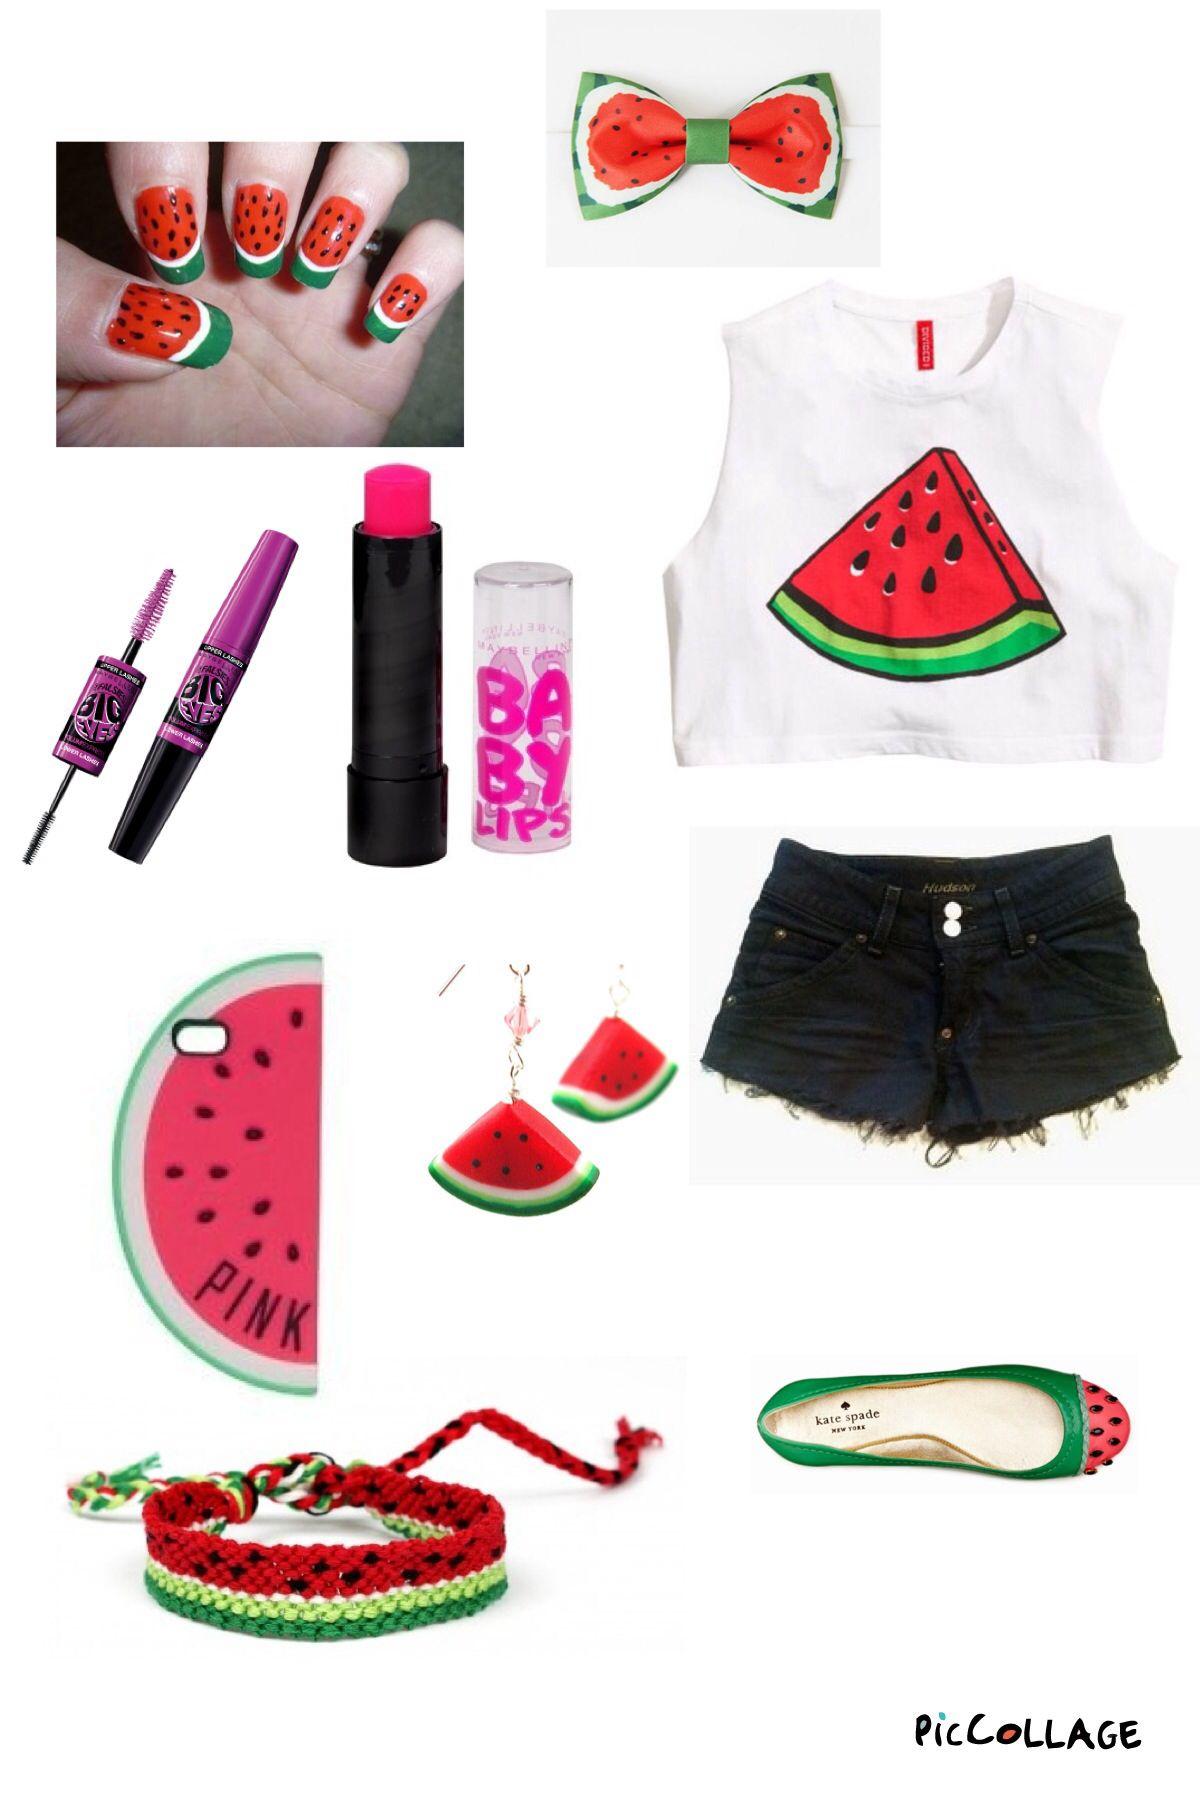 Cute melon outfit!